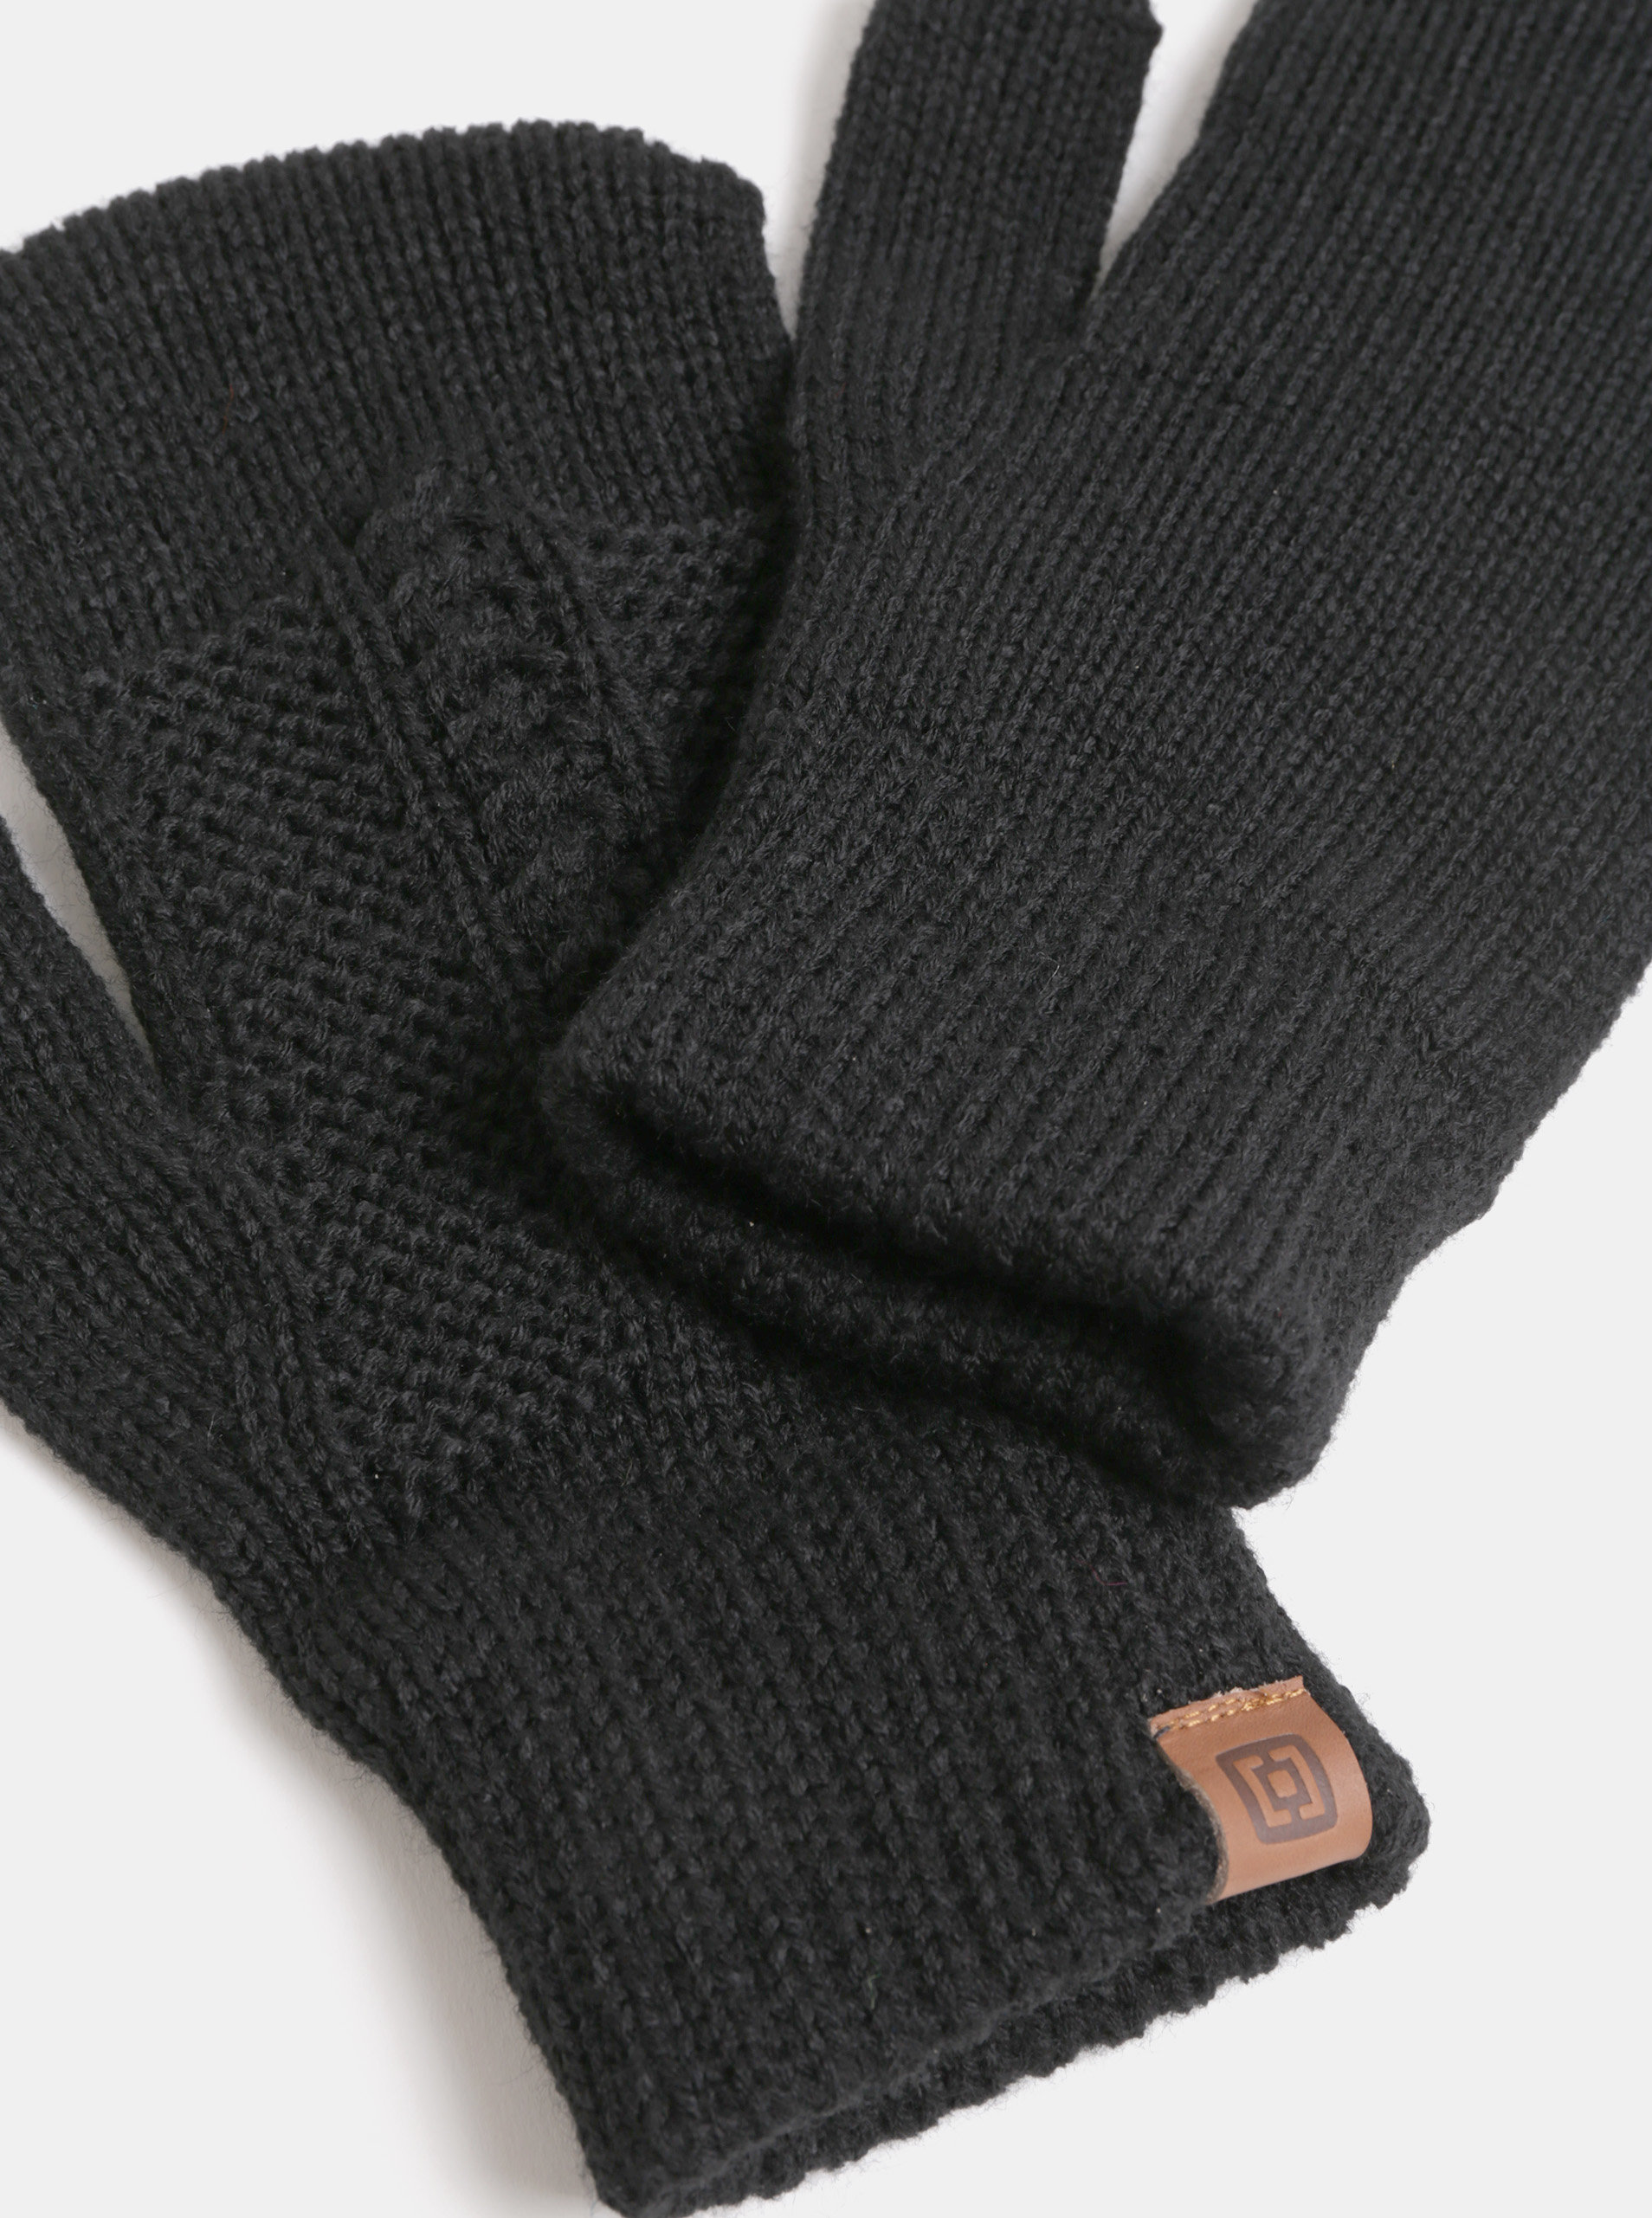 f0166eaed0ca Čierne dámske pletené rukavice Horsefeathers Zara ...